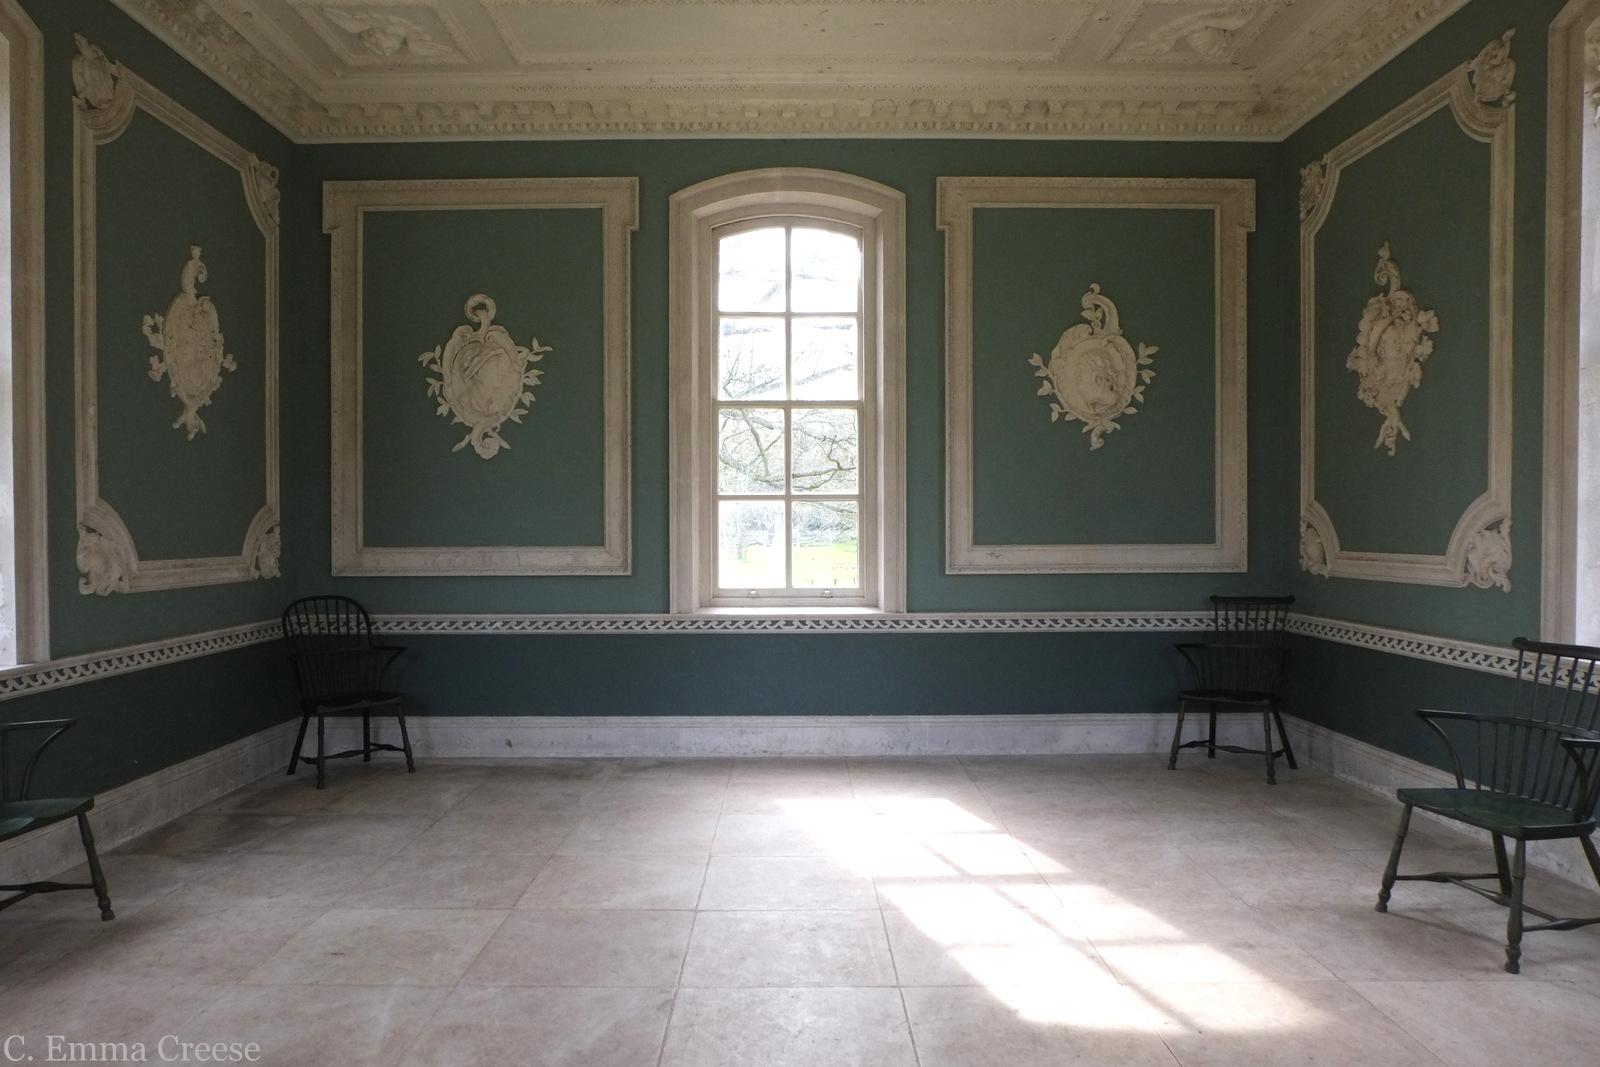 Osterley House & Gardens, London - Adventures of a London Kiwi